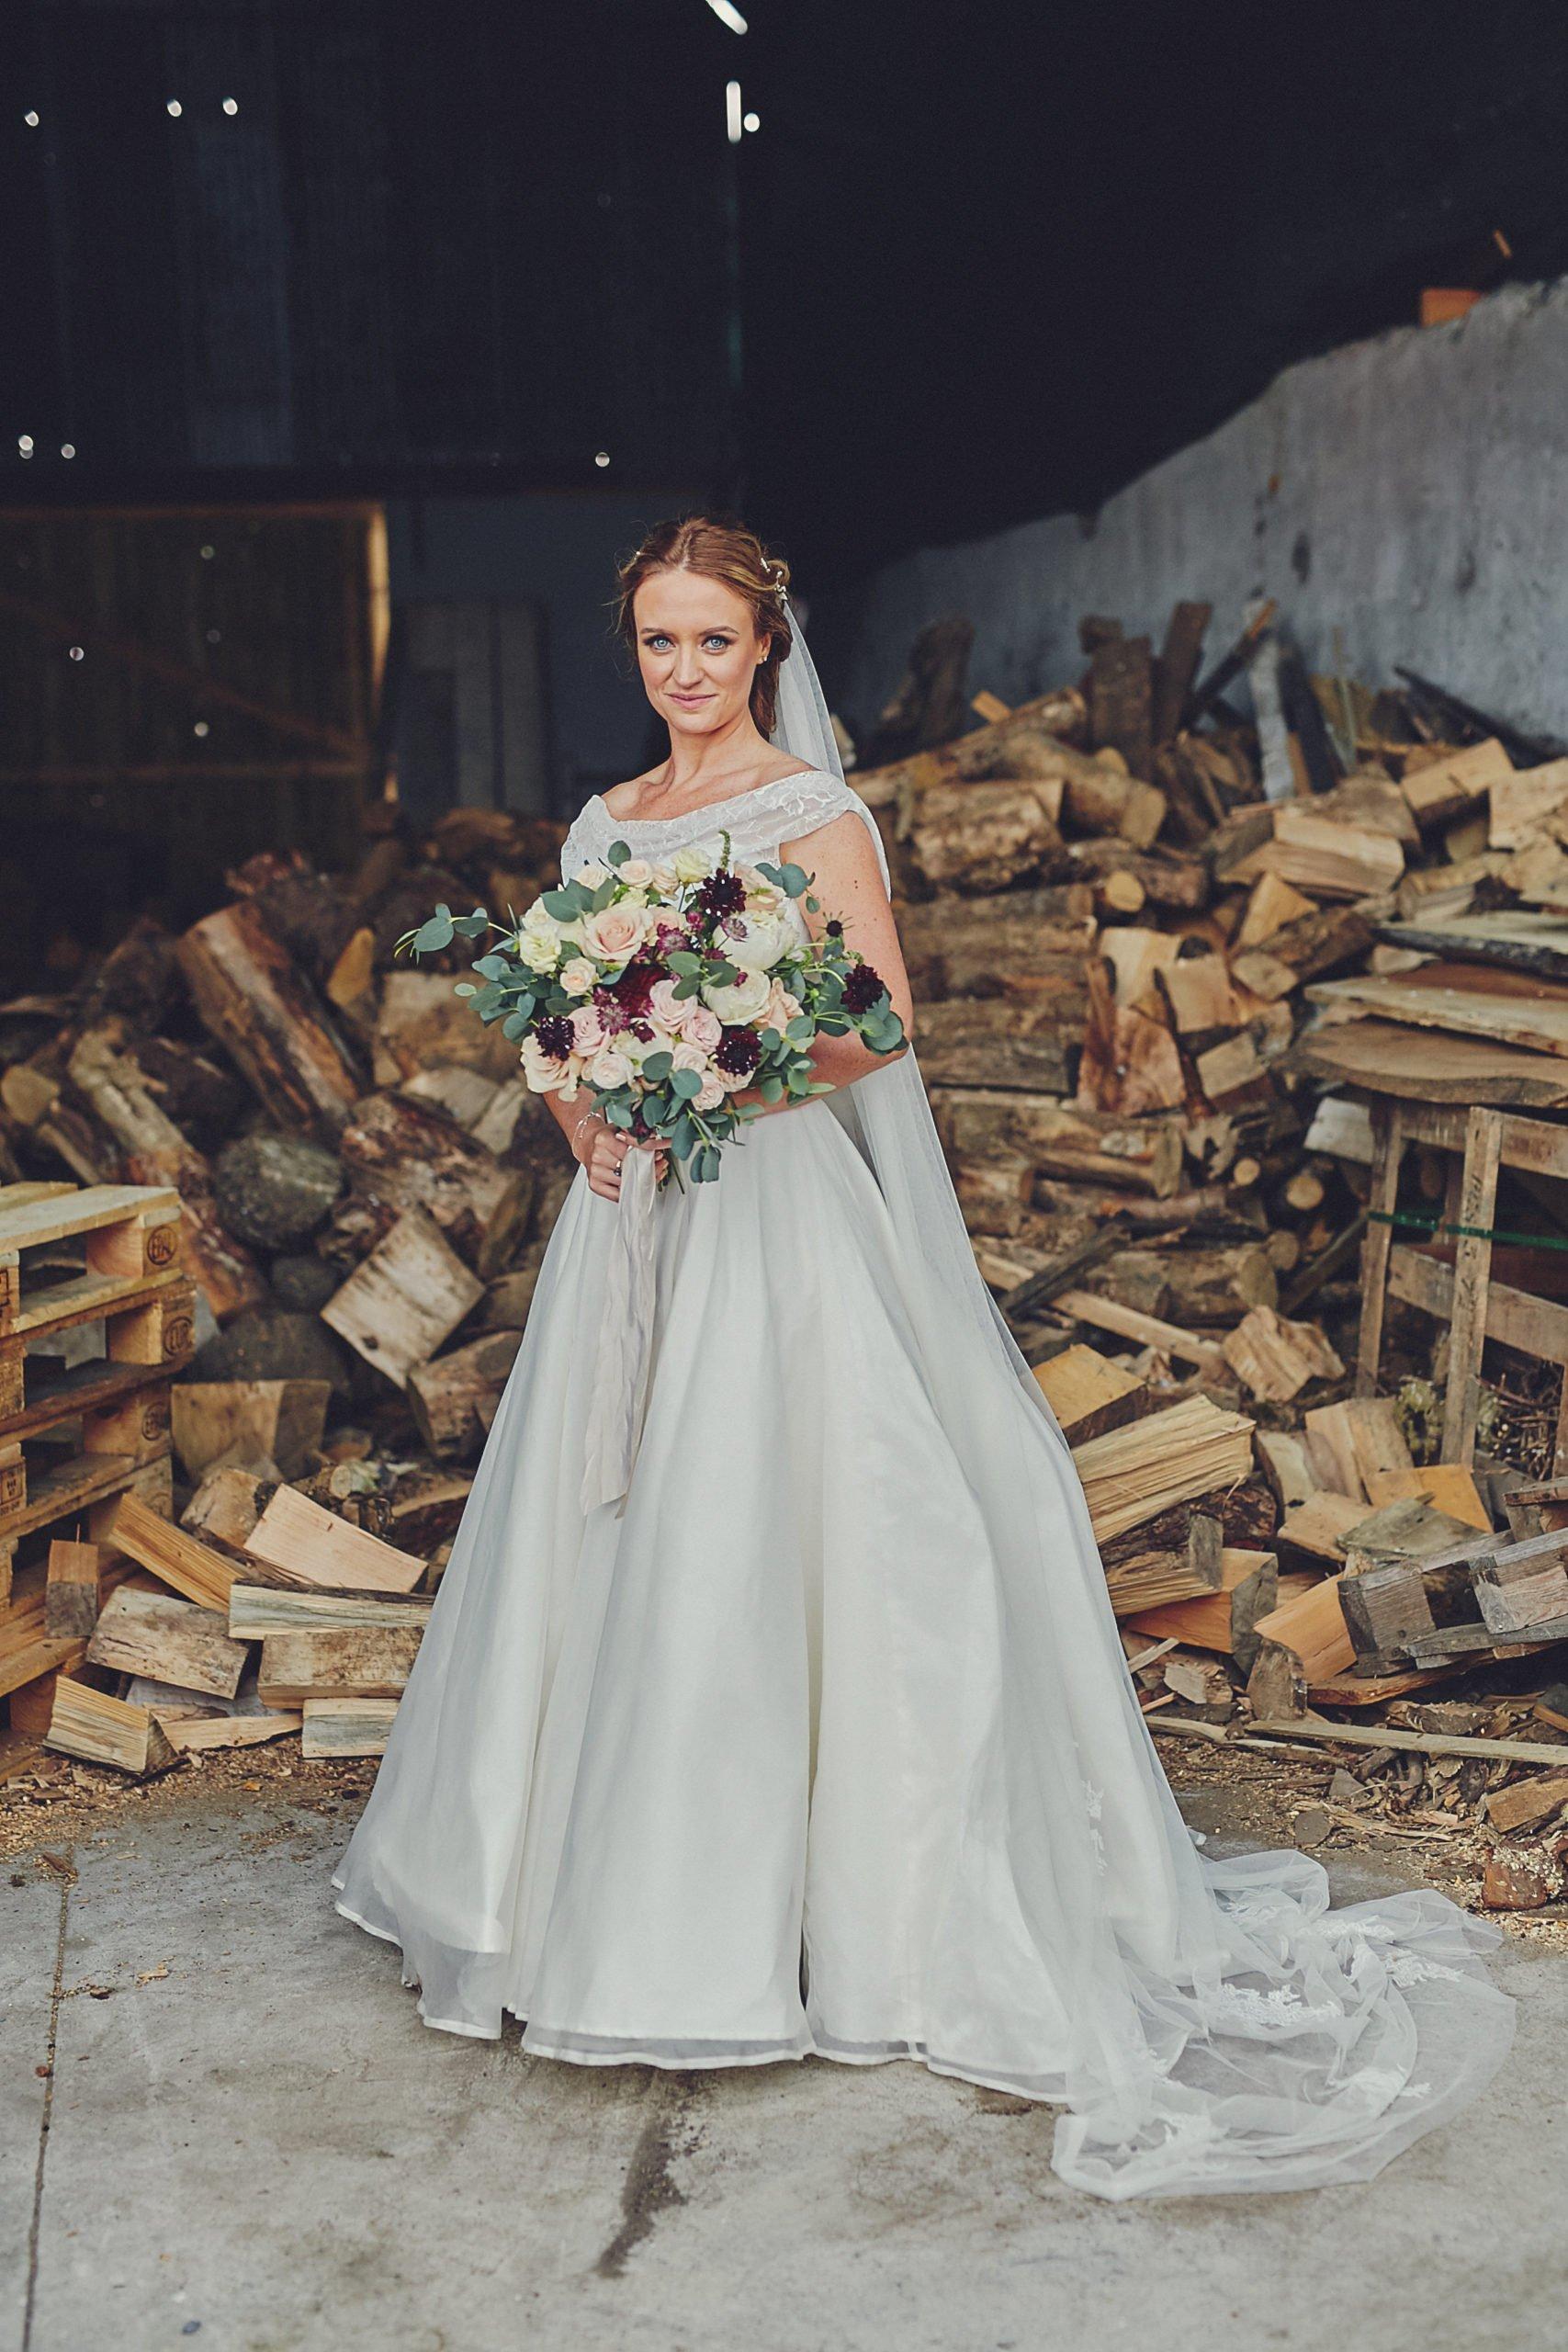 Cloughjordan House Wedding - Alternative Venue 109